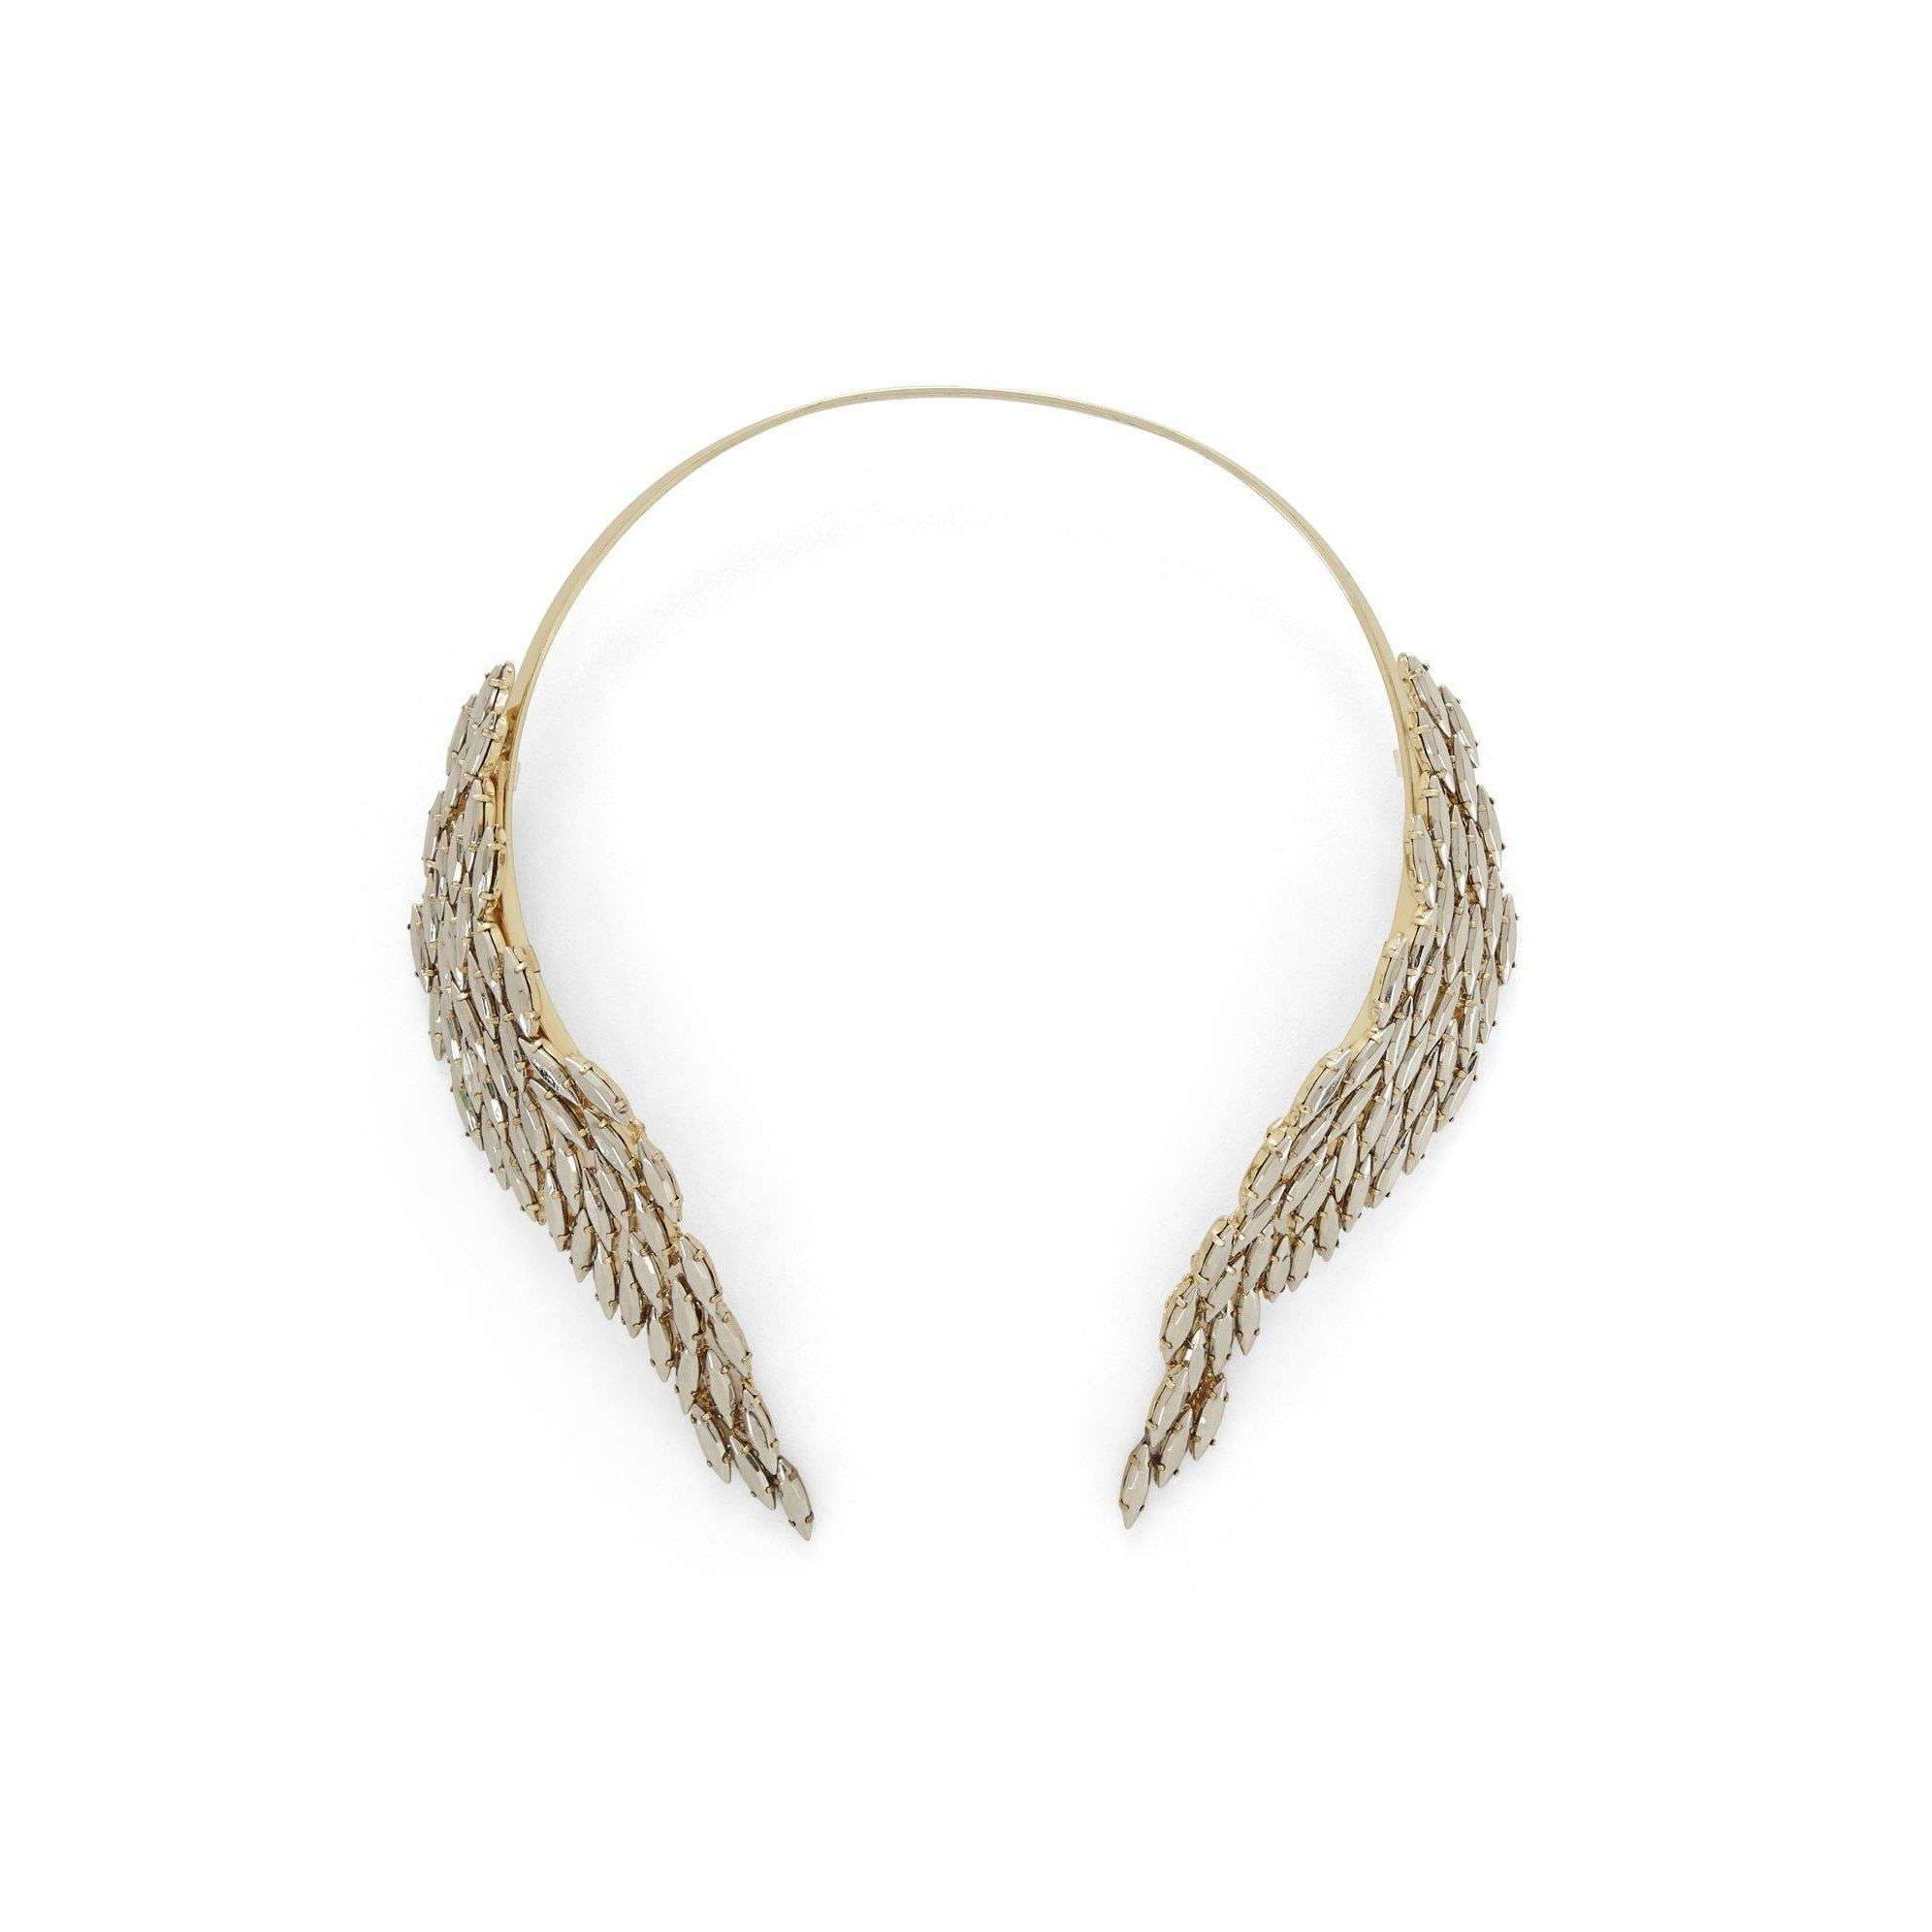 BCBGMAXAZRIA Bcbg Maxazria Metal Stone Fringe Collar Necklace in Metallic